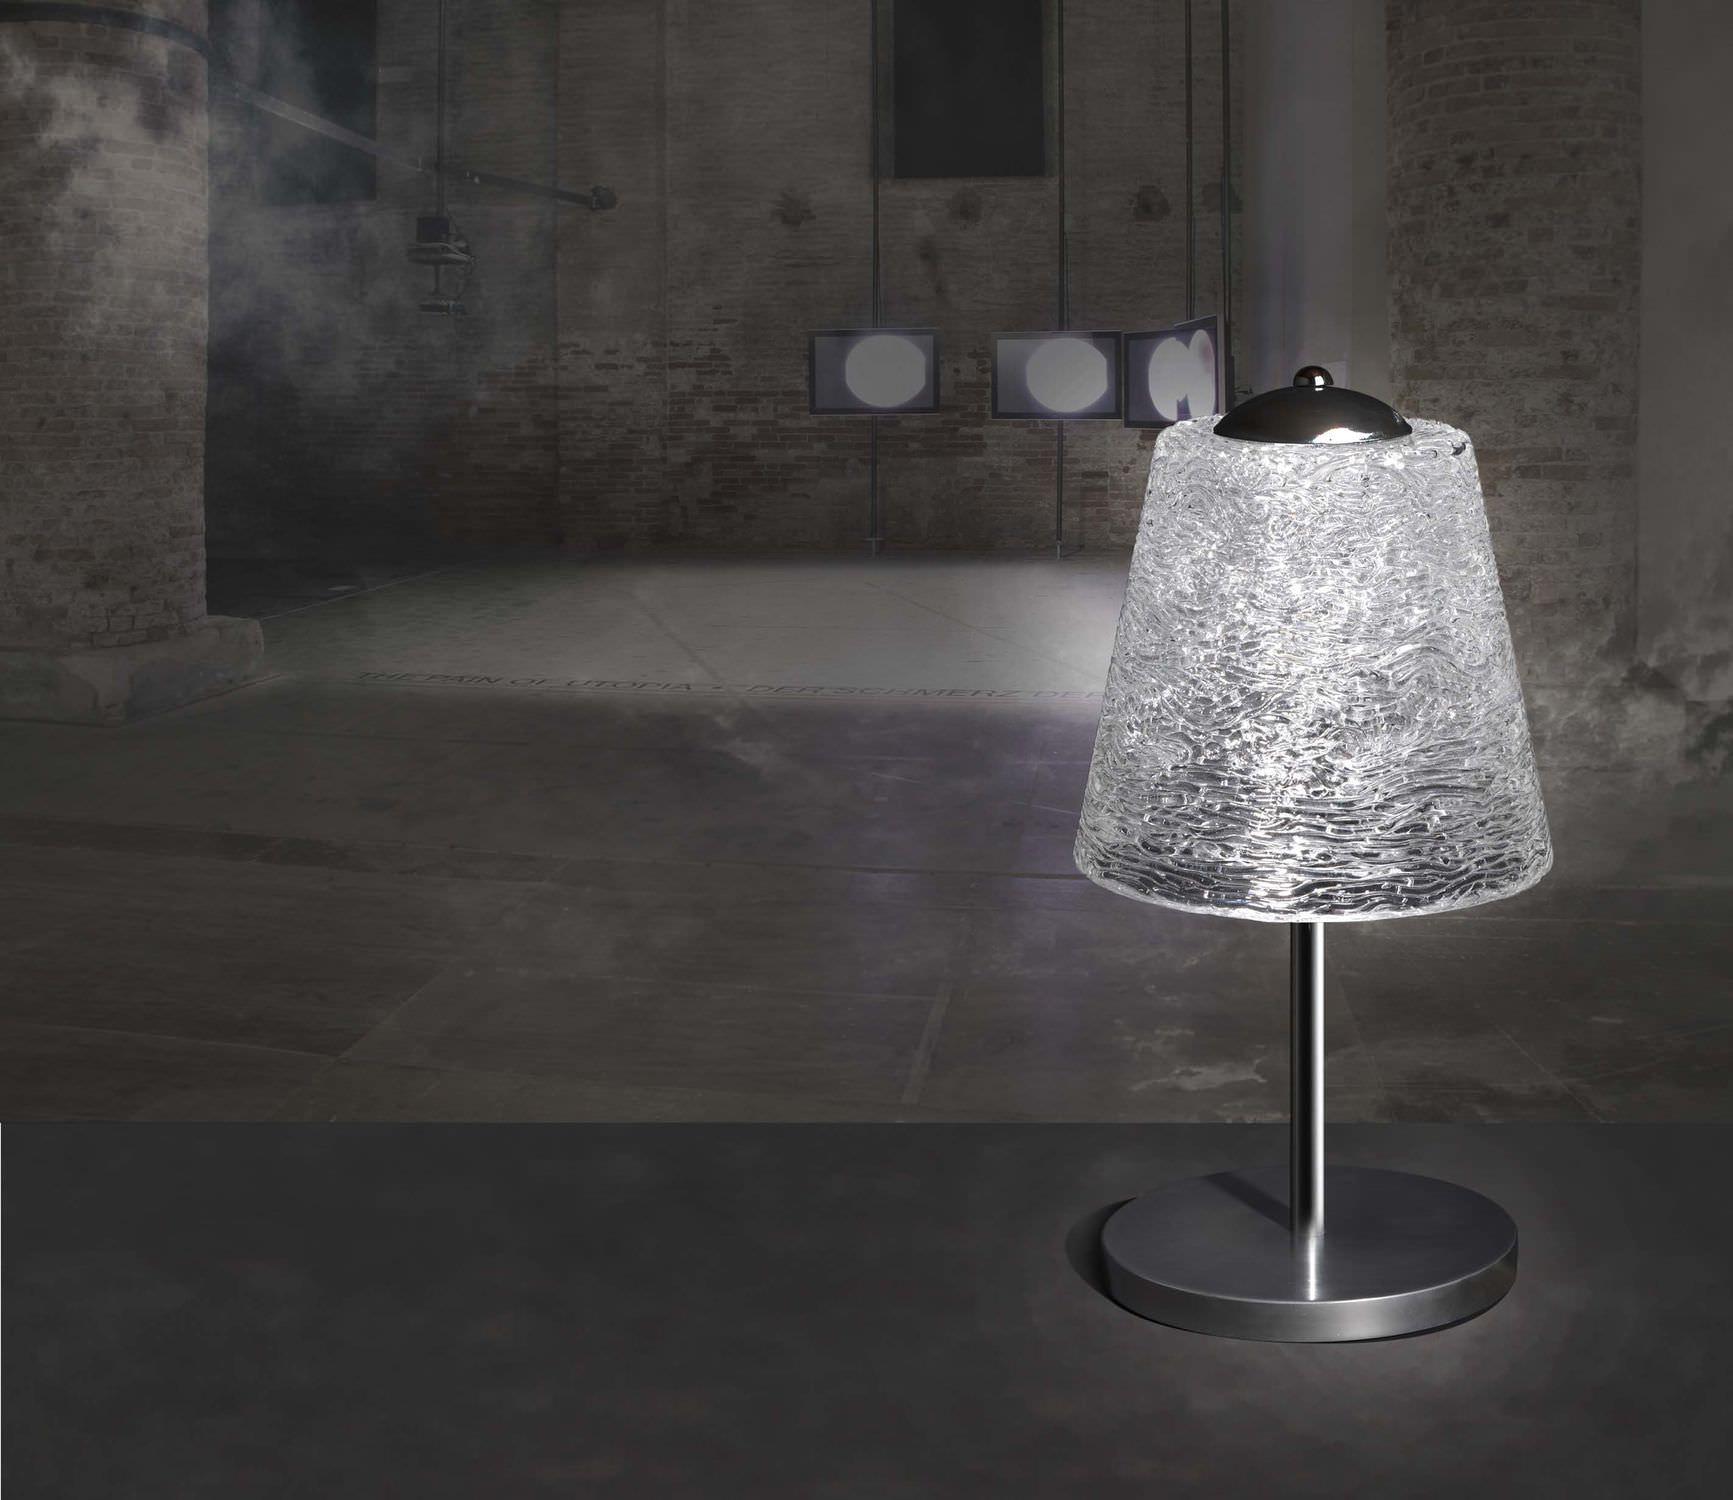 Lampe de chevet blanche originale